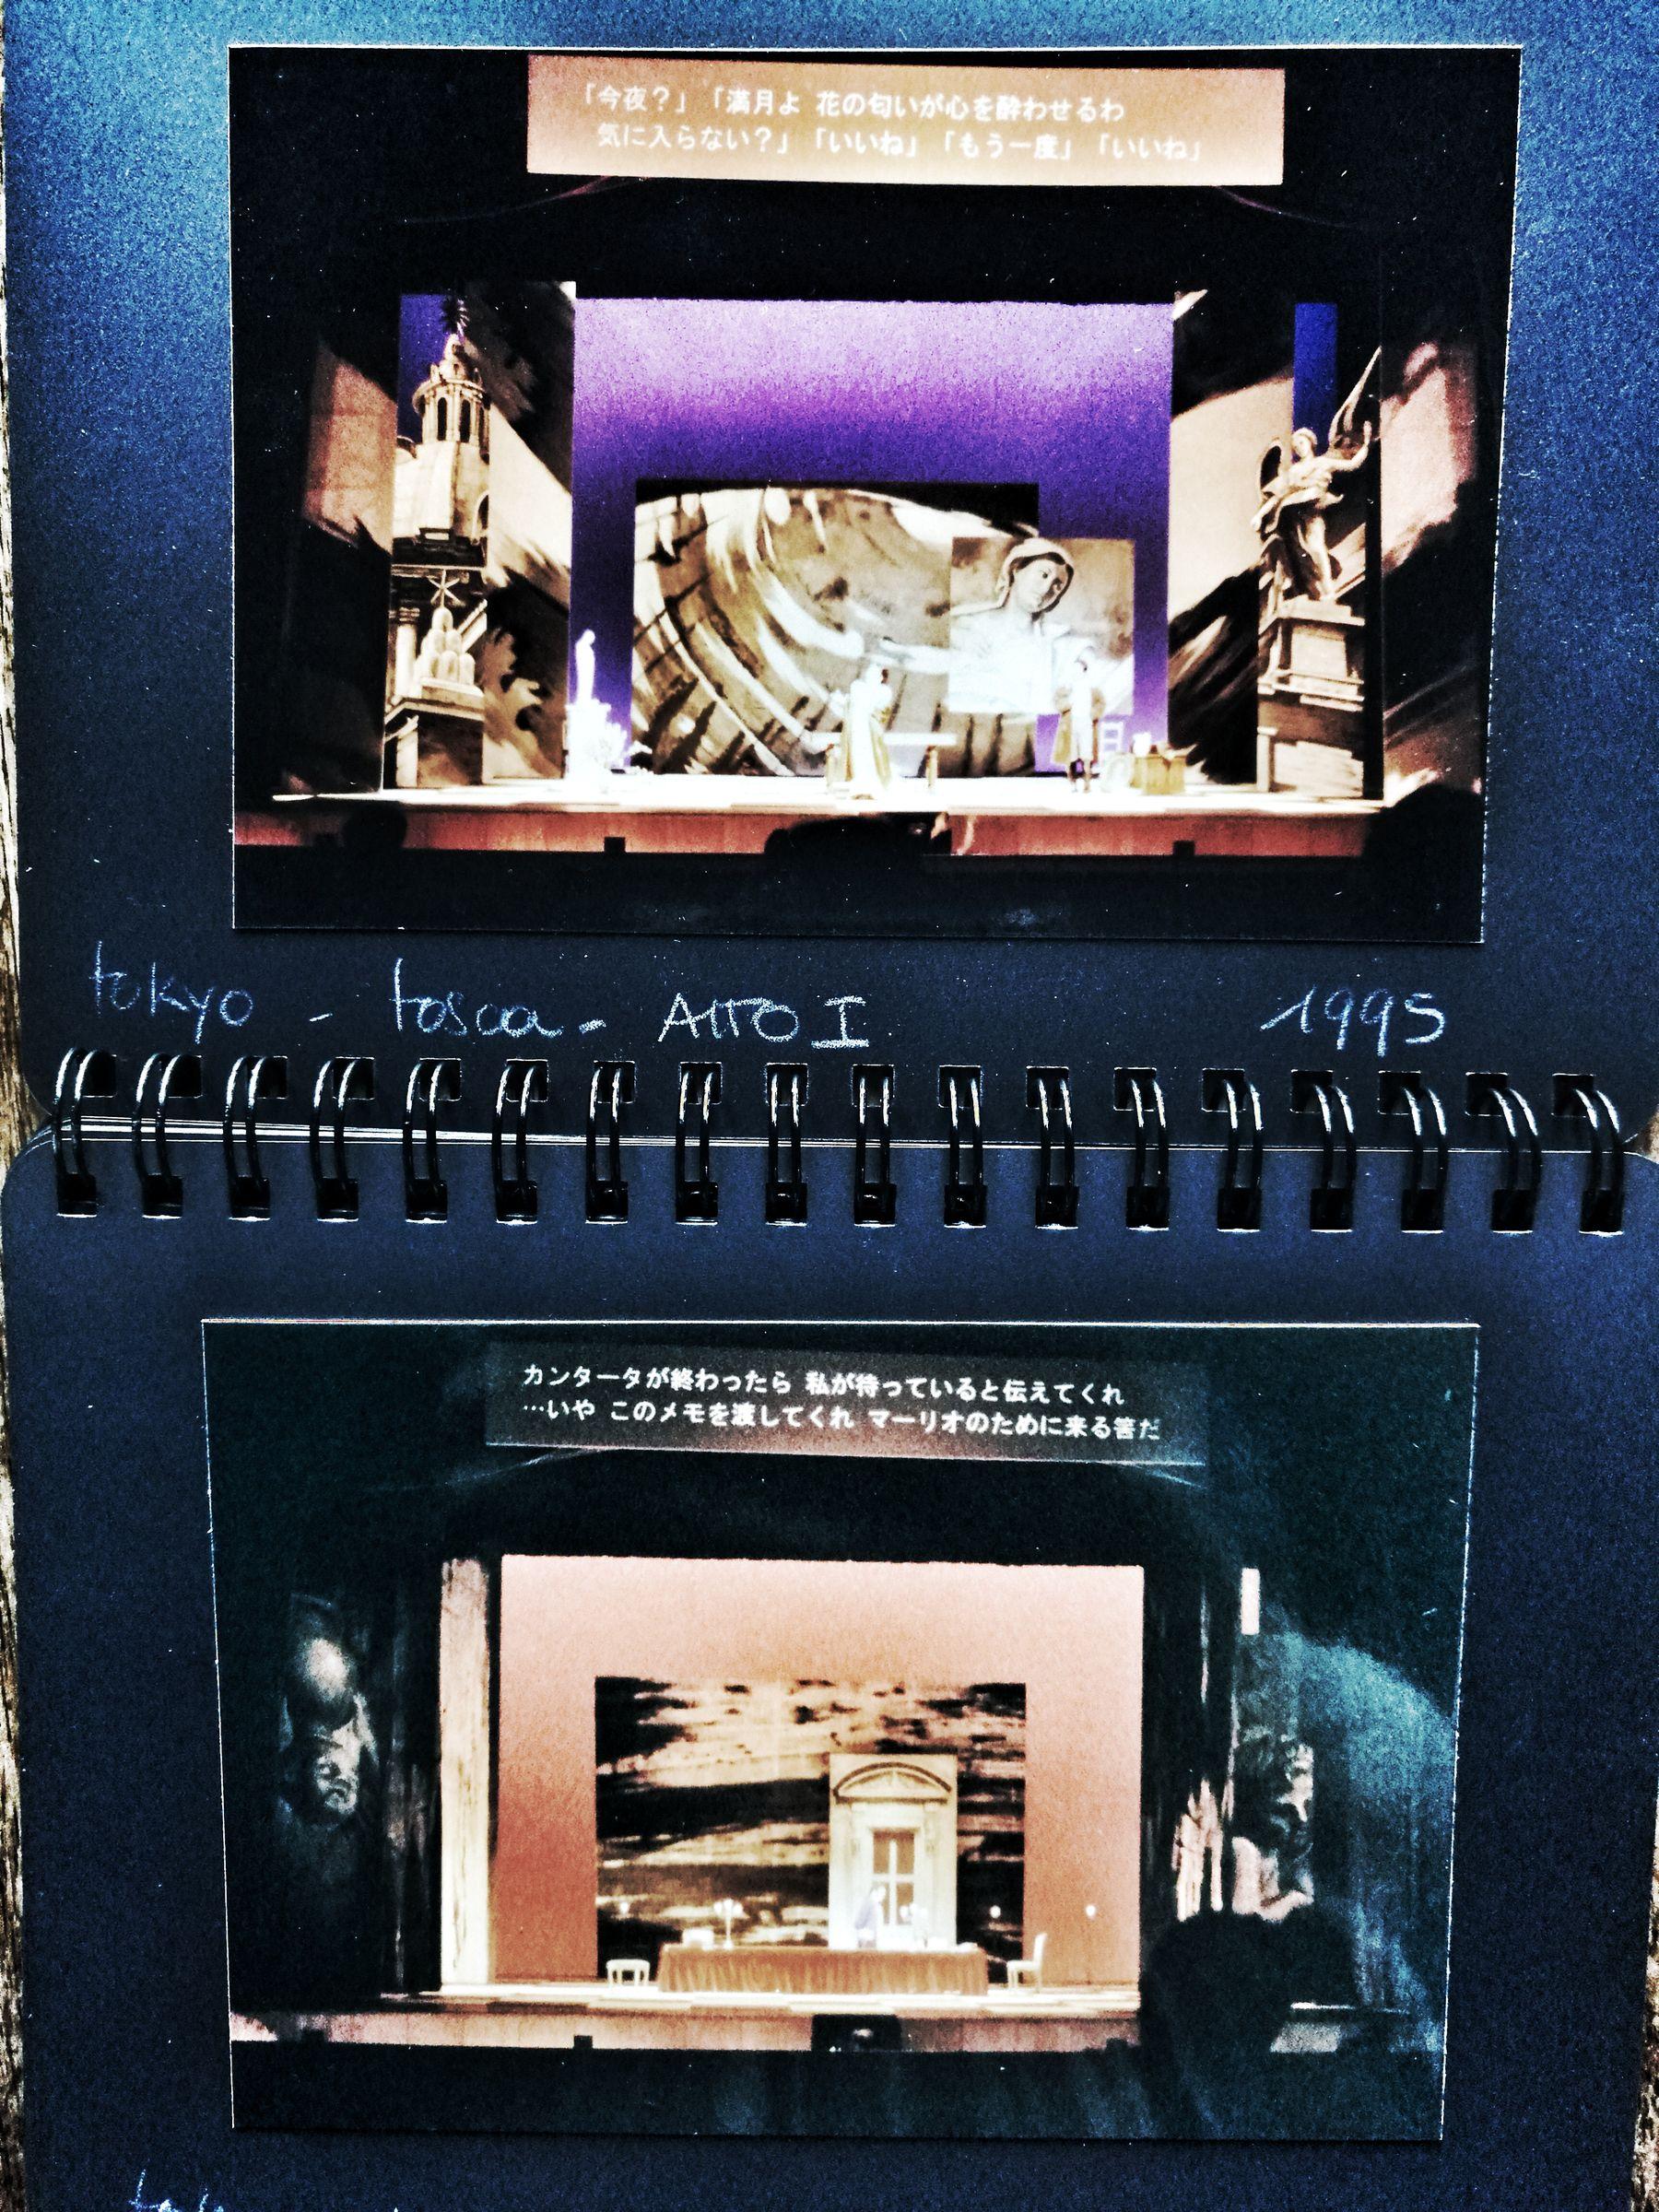 scenografie Tosca a tokyo Blossom zine